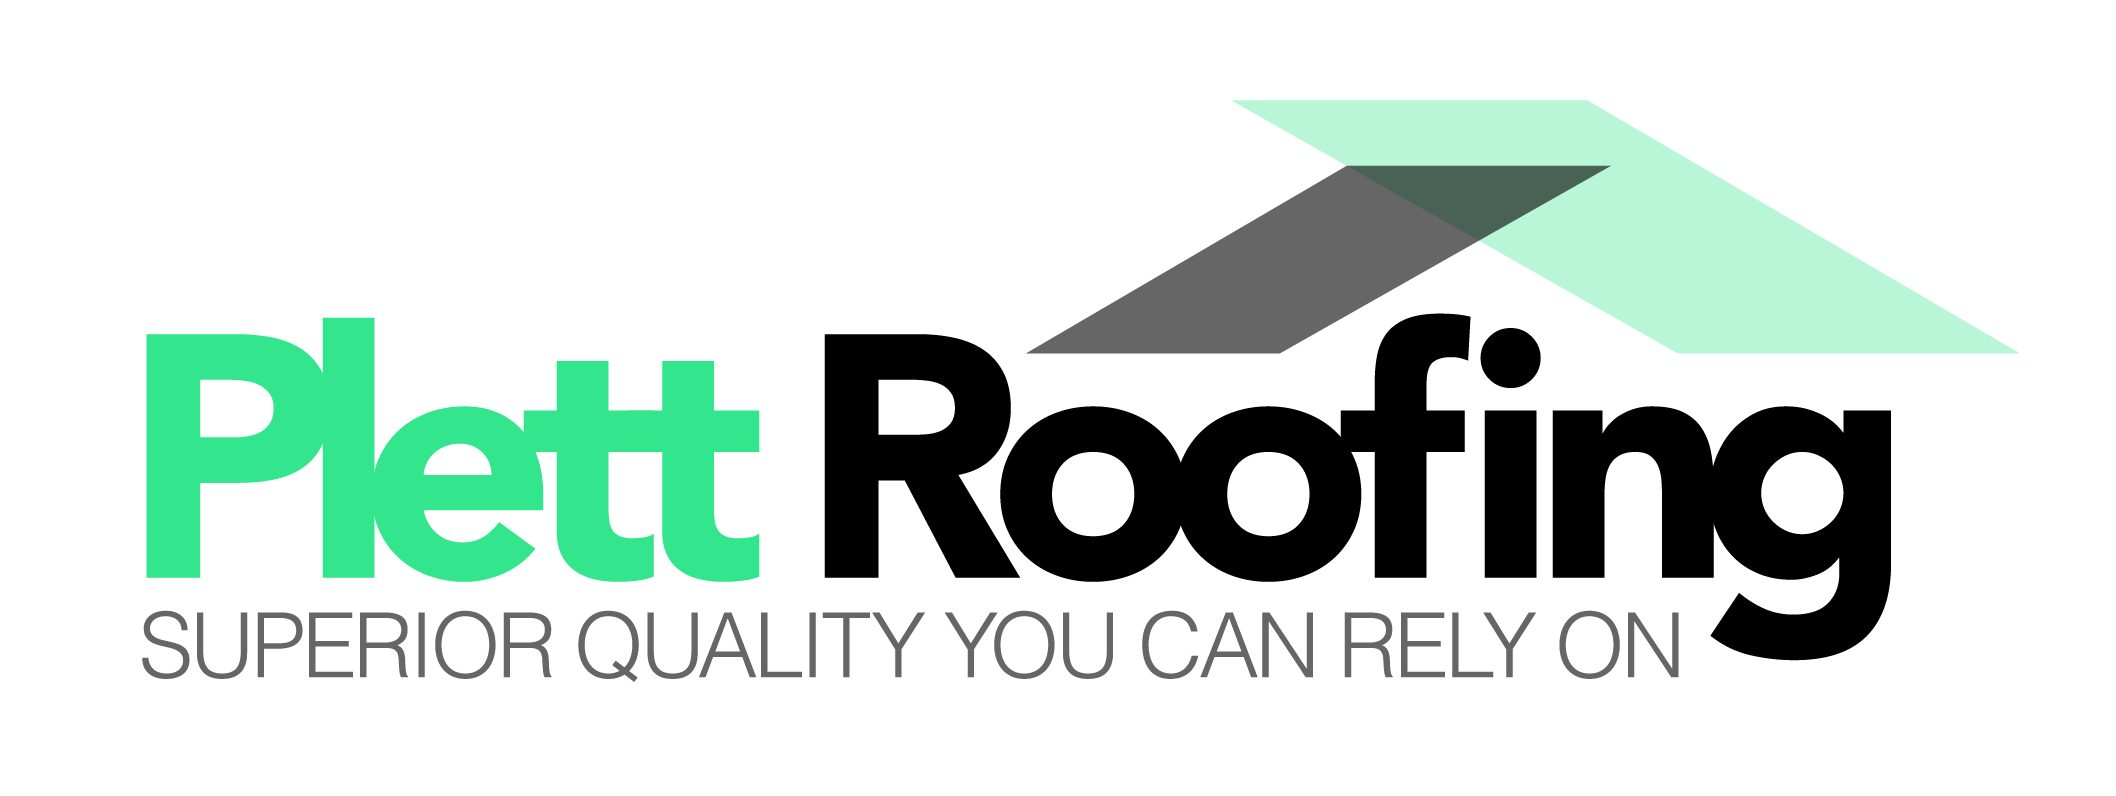 Plett Roofing